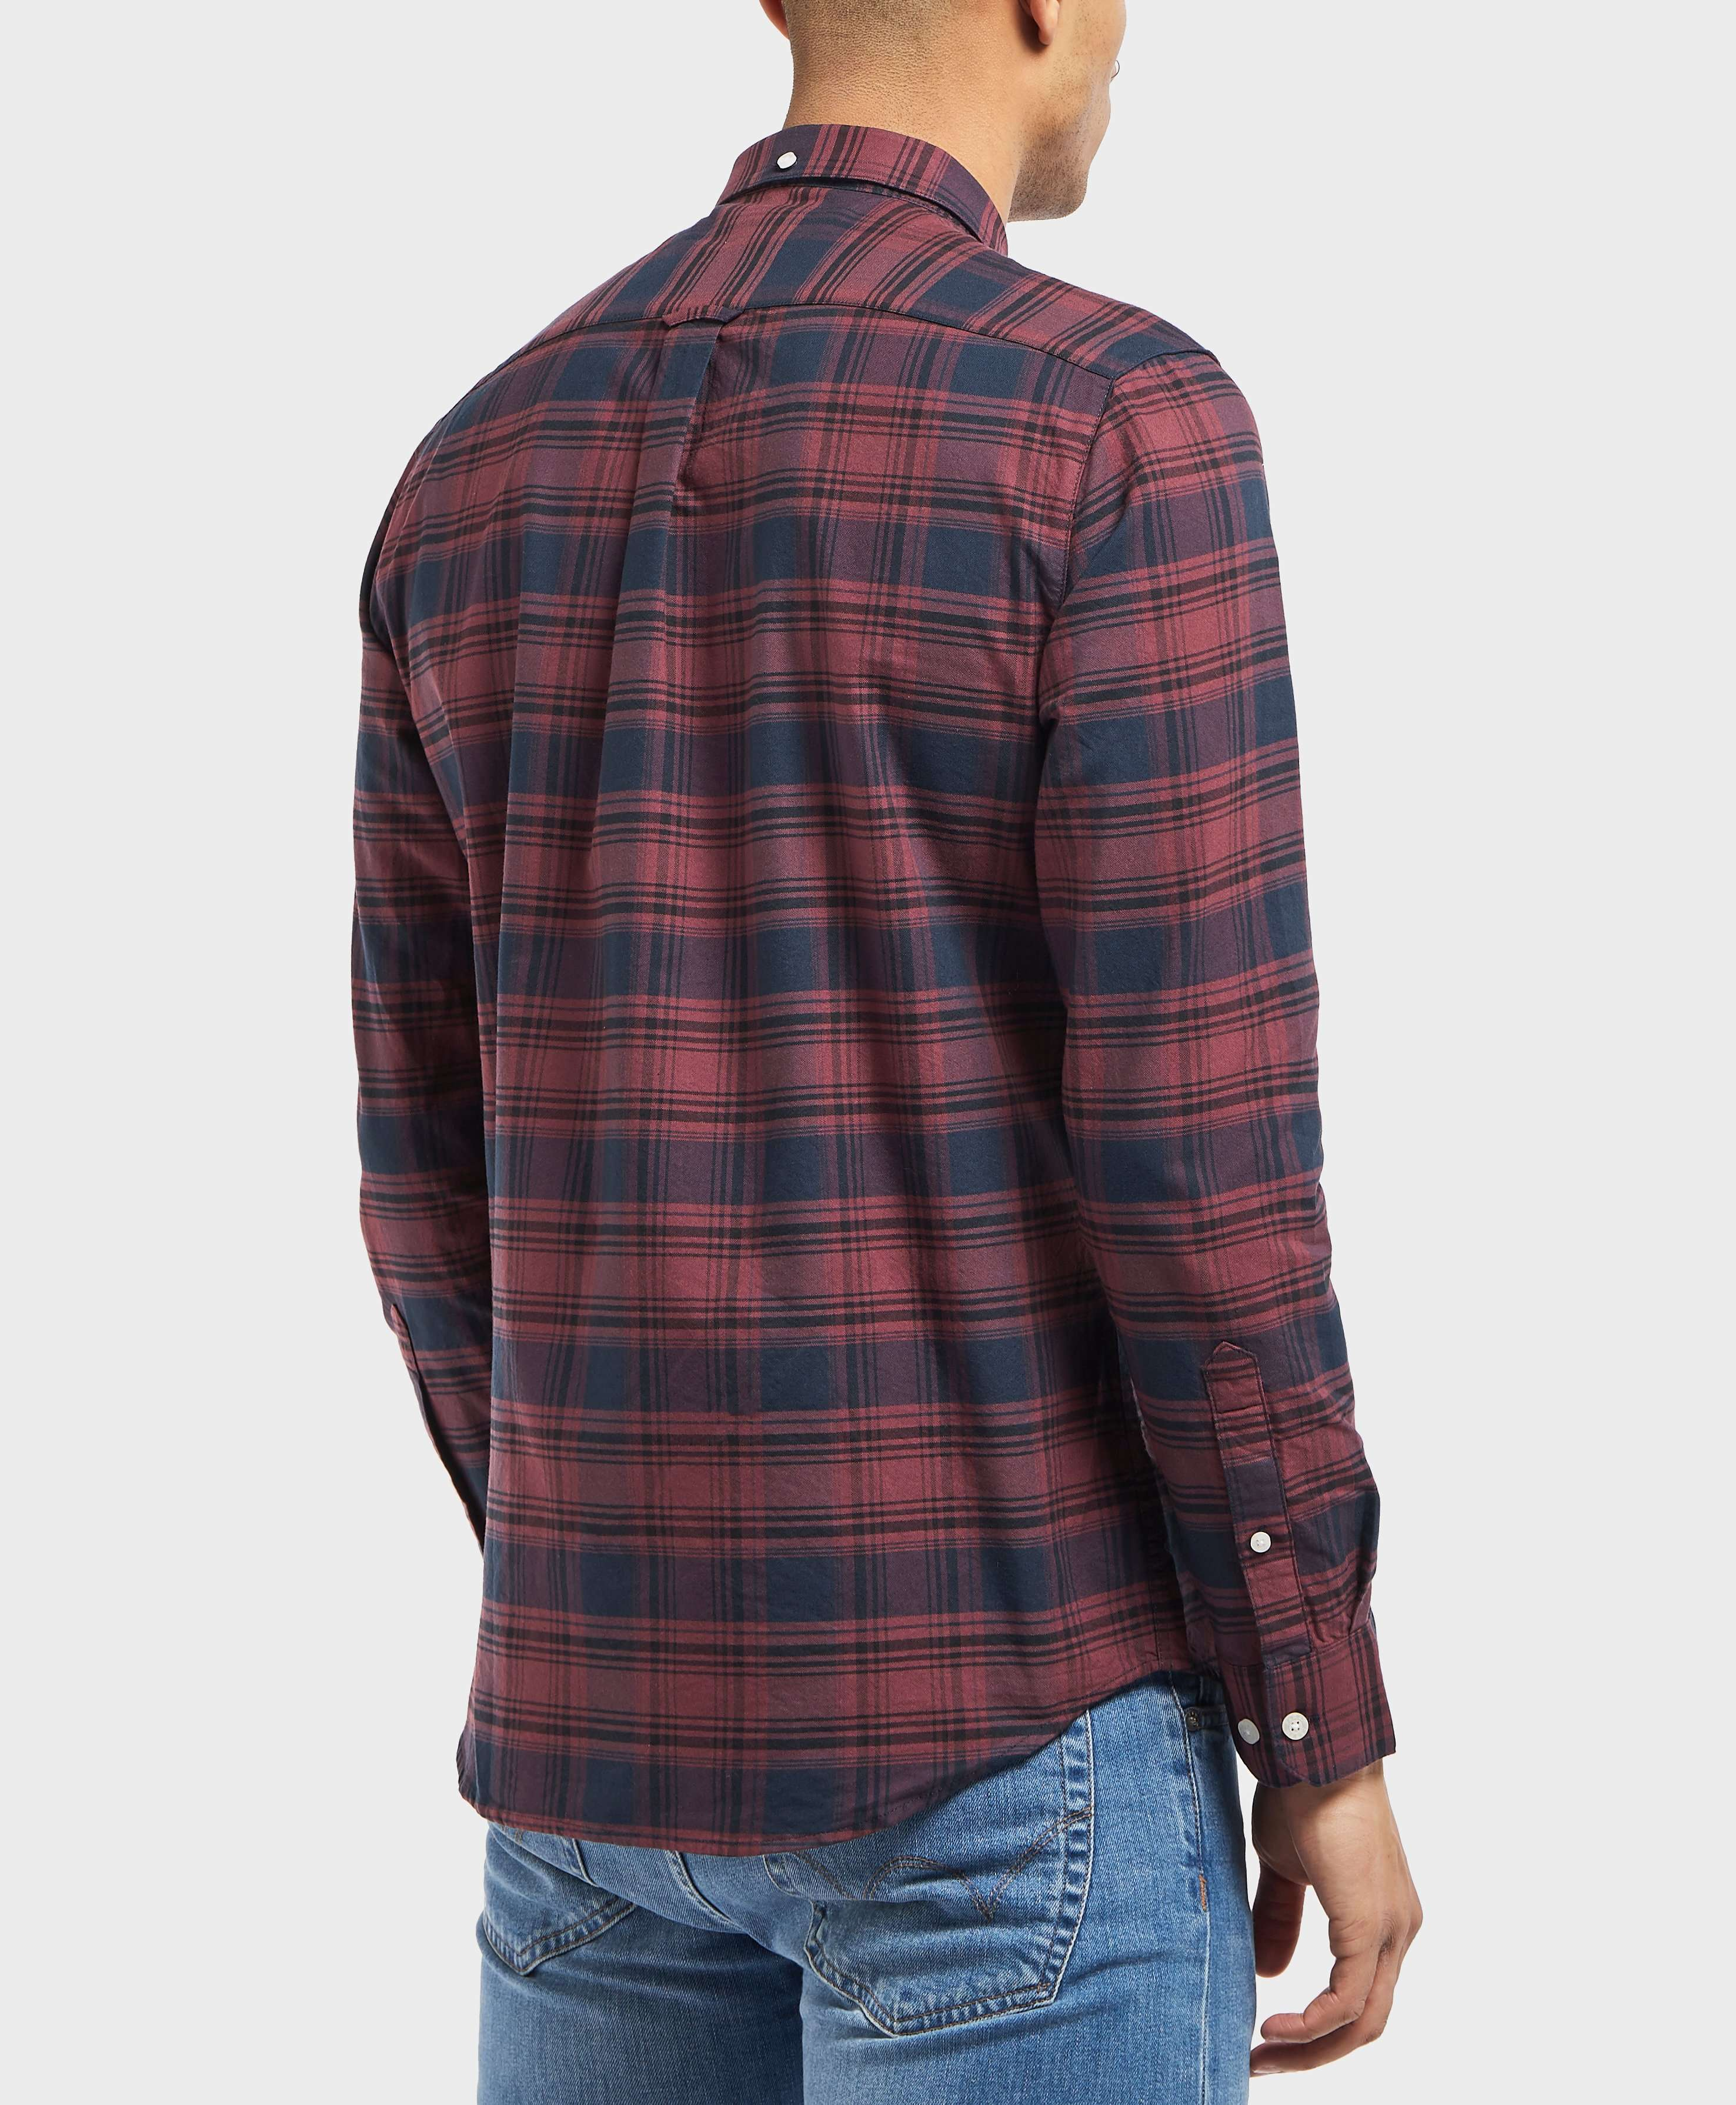 Farah Check Long Sleeve Shirt